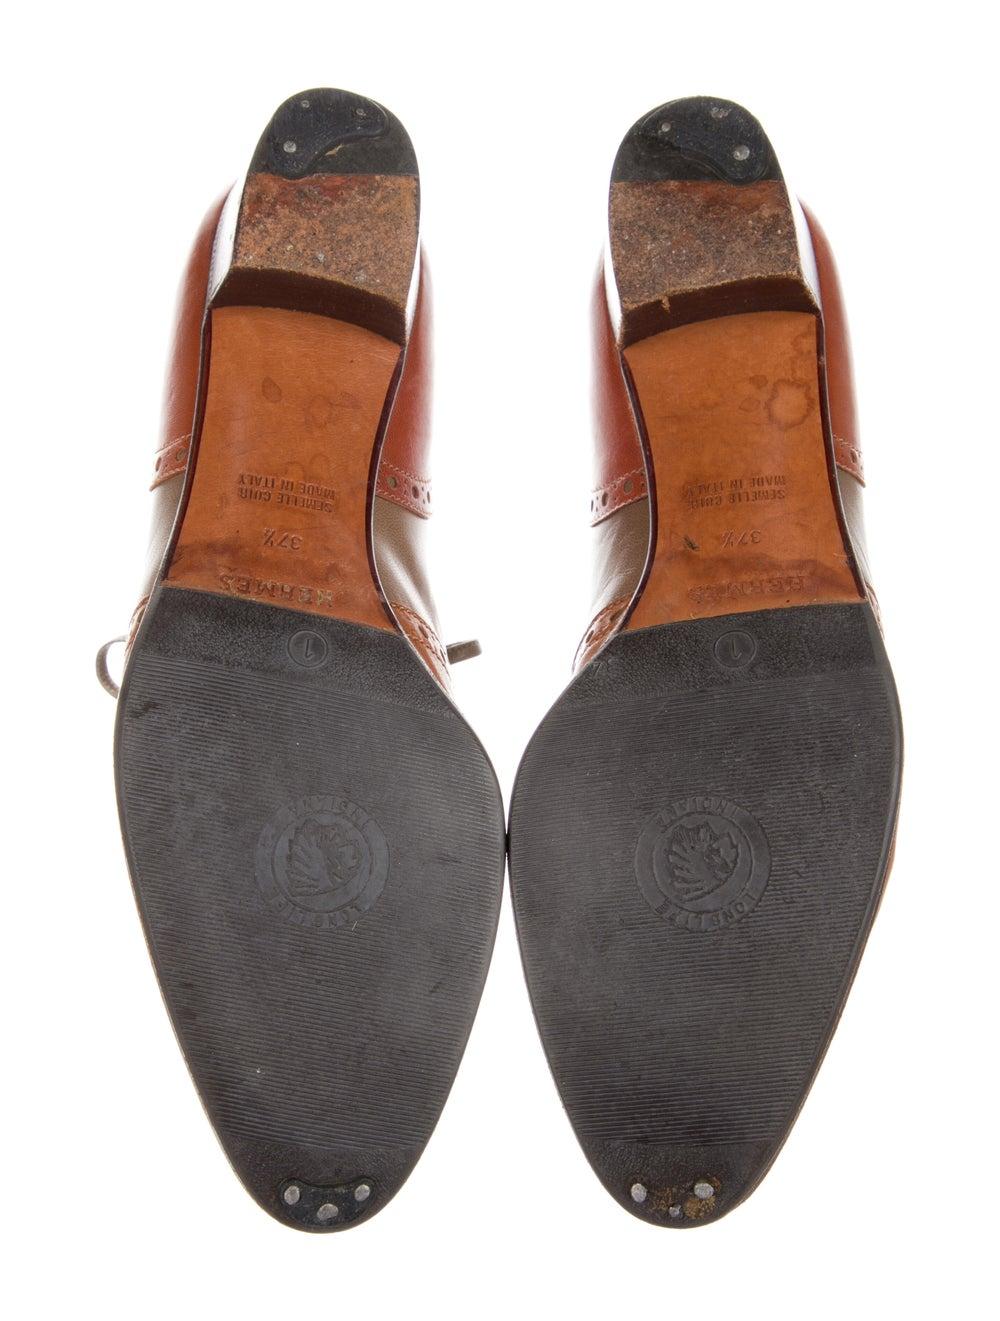 Hermès Vintage Leather Oxfords Brown - image 5